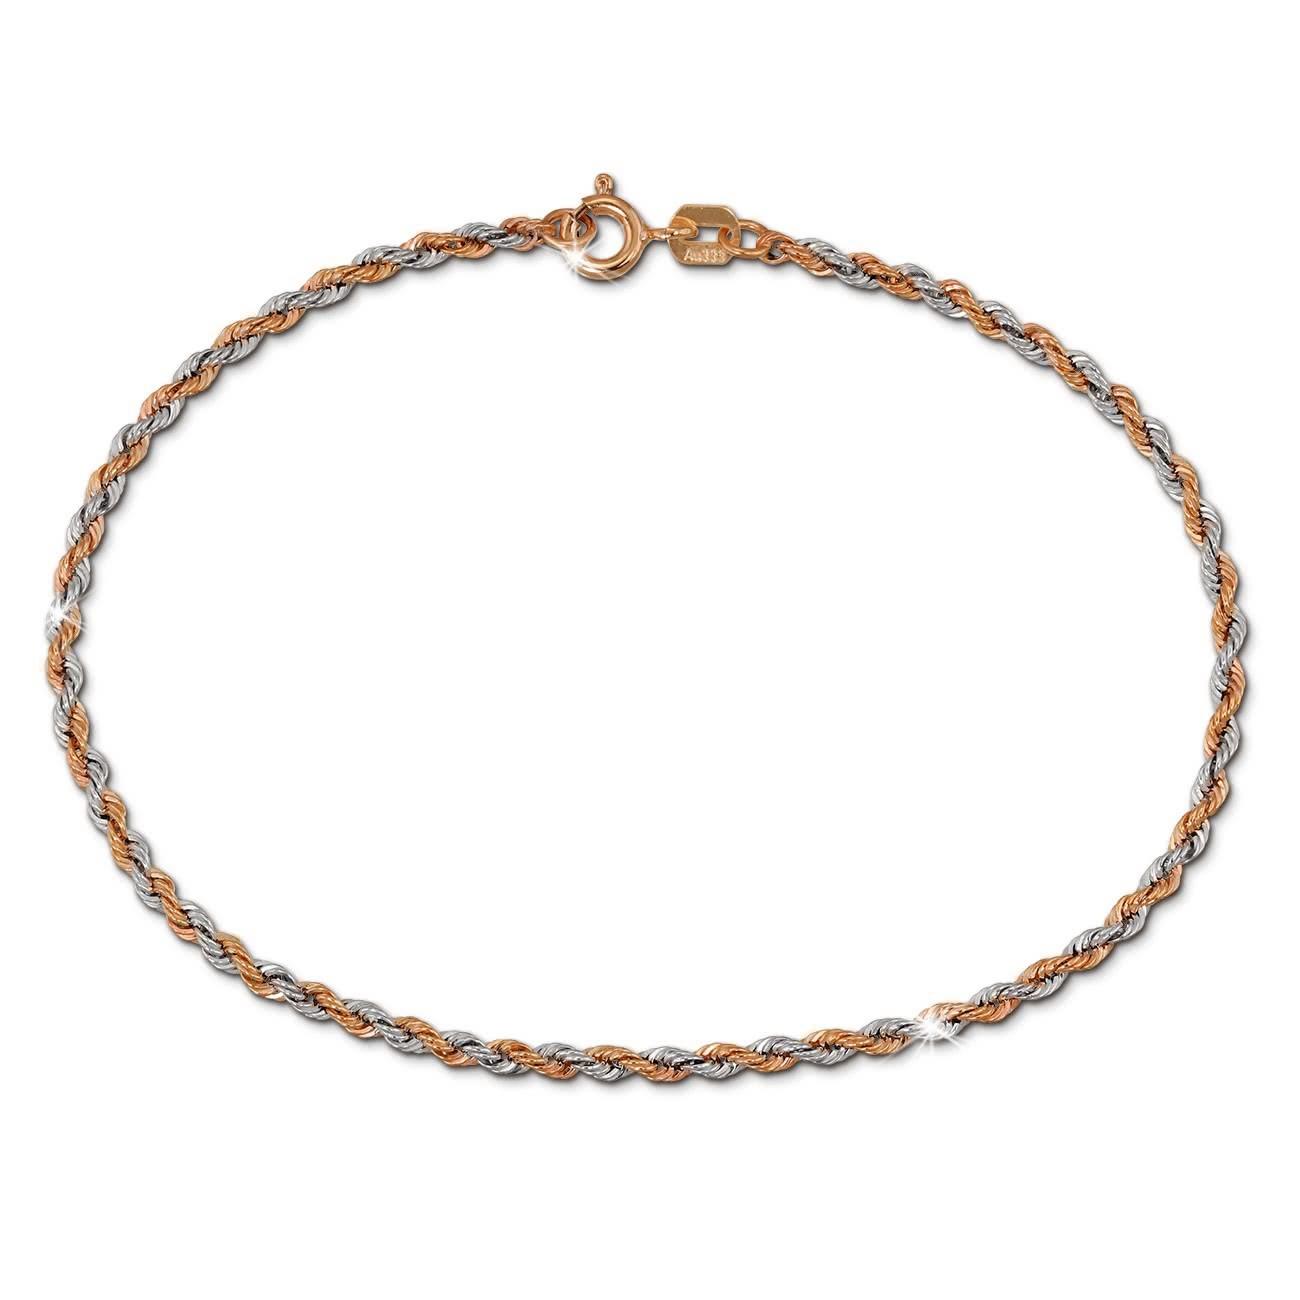 SilberDream Armband Zopf bicolor Rose Gold 19cm 8 Karat GDA0529E